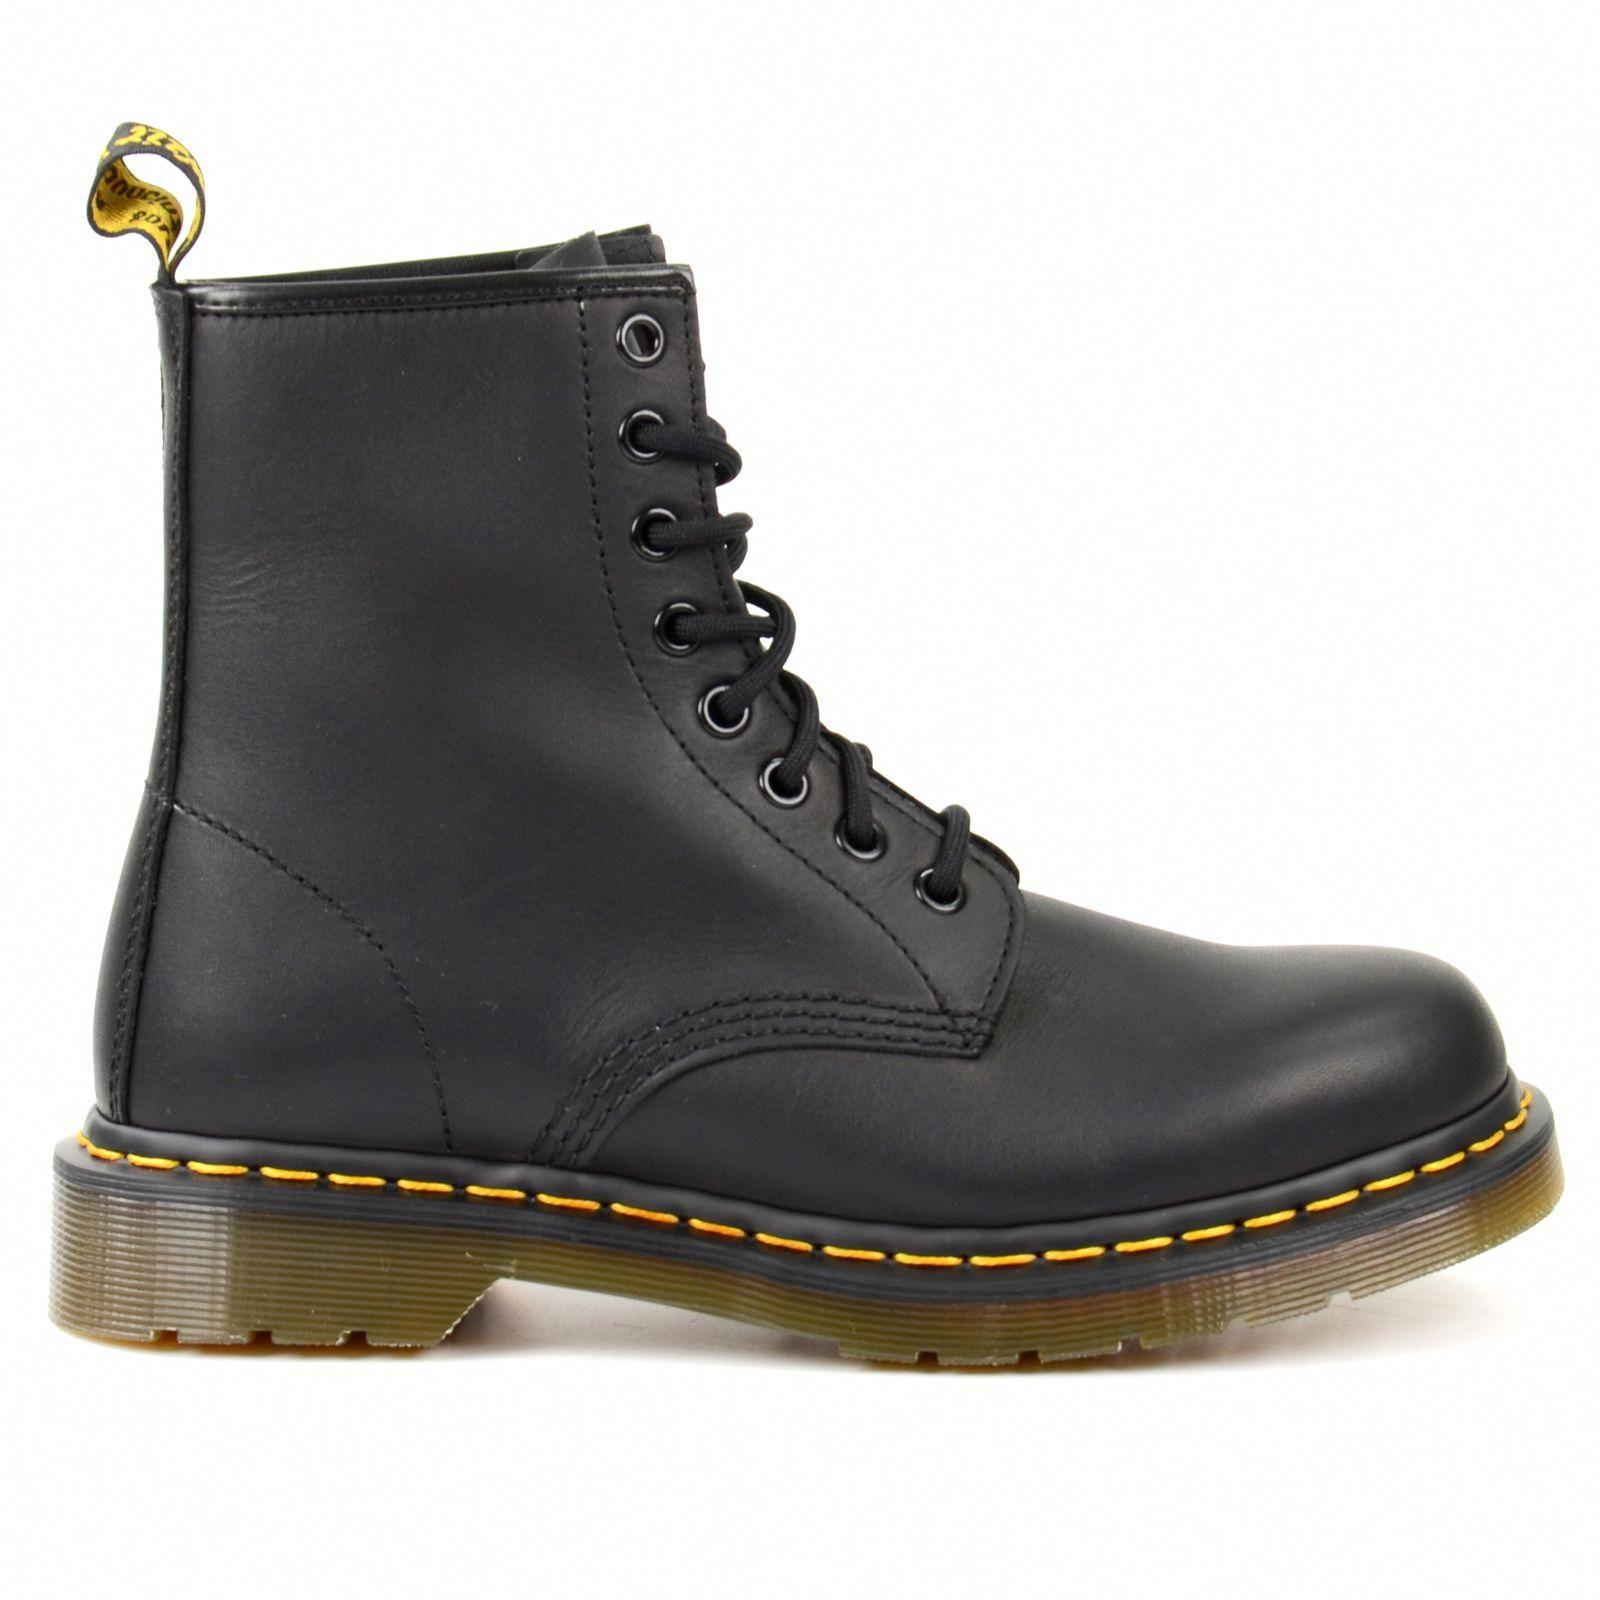 Boots, Dr martens boots, Doc martens